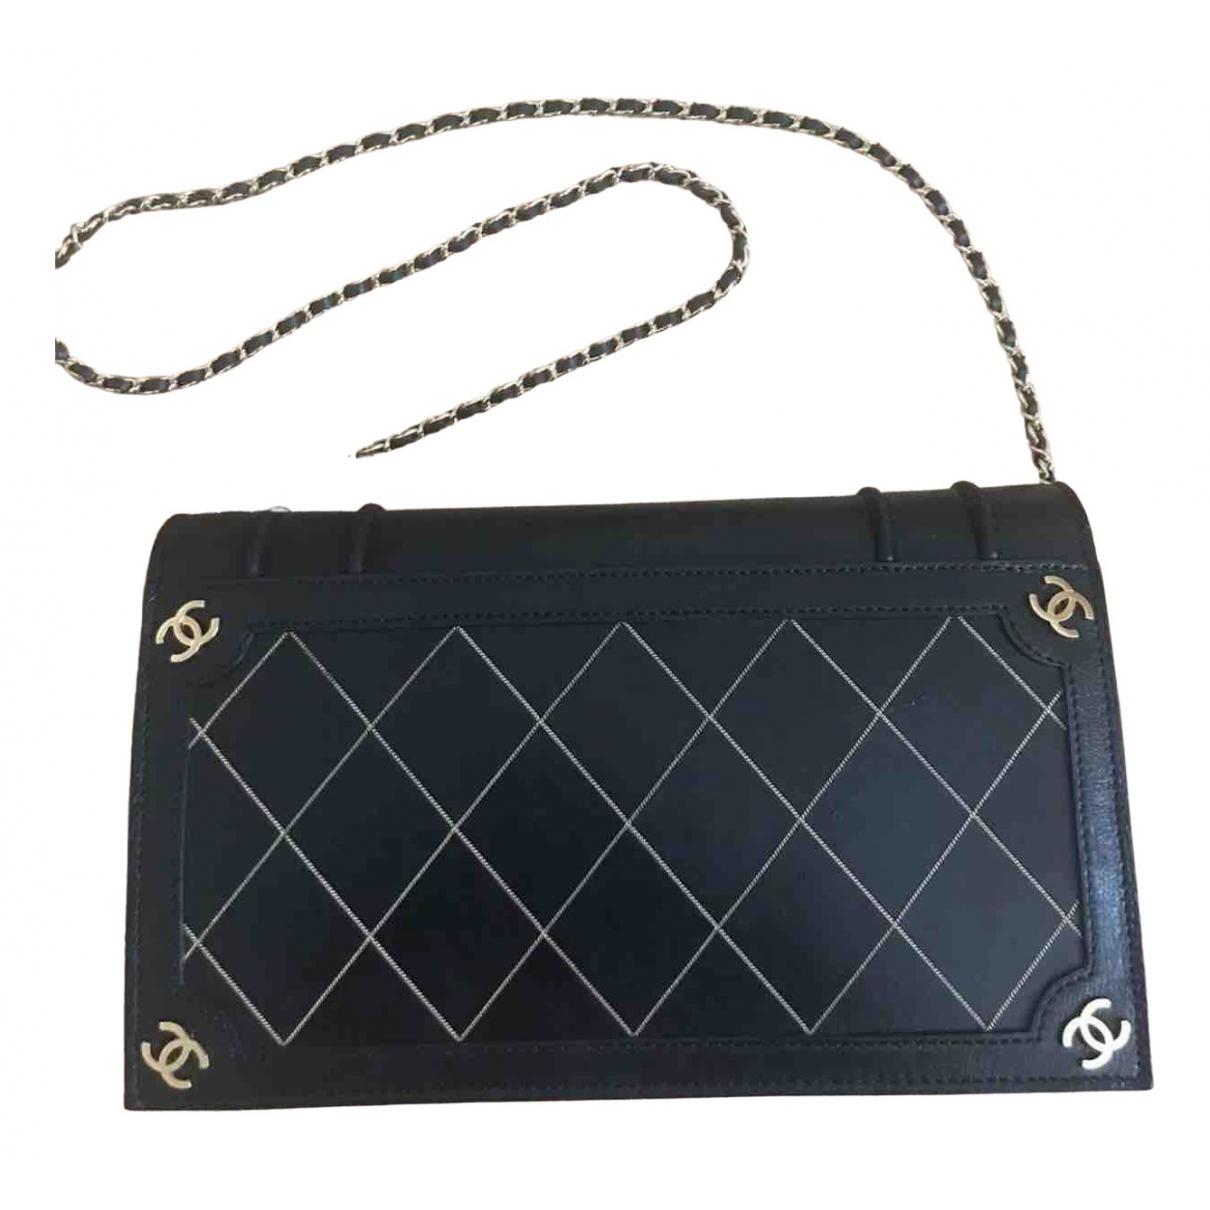 Chanel \N Clutch in  Schwarz Leder